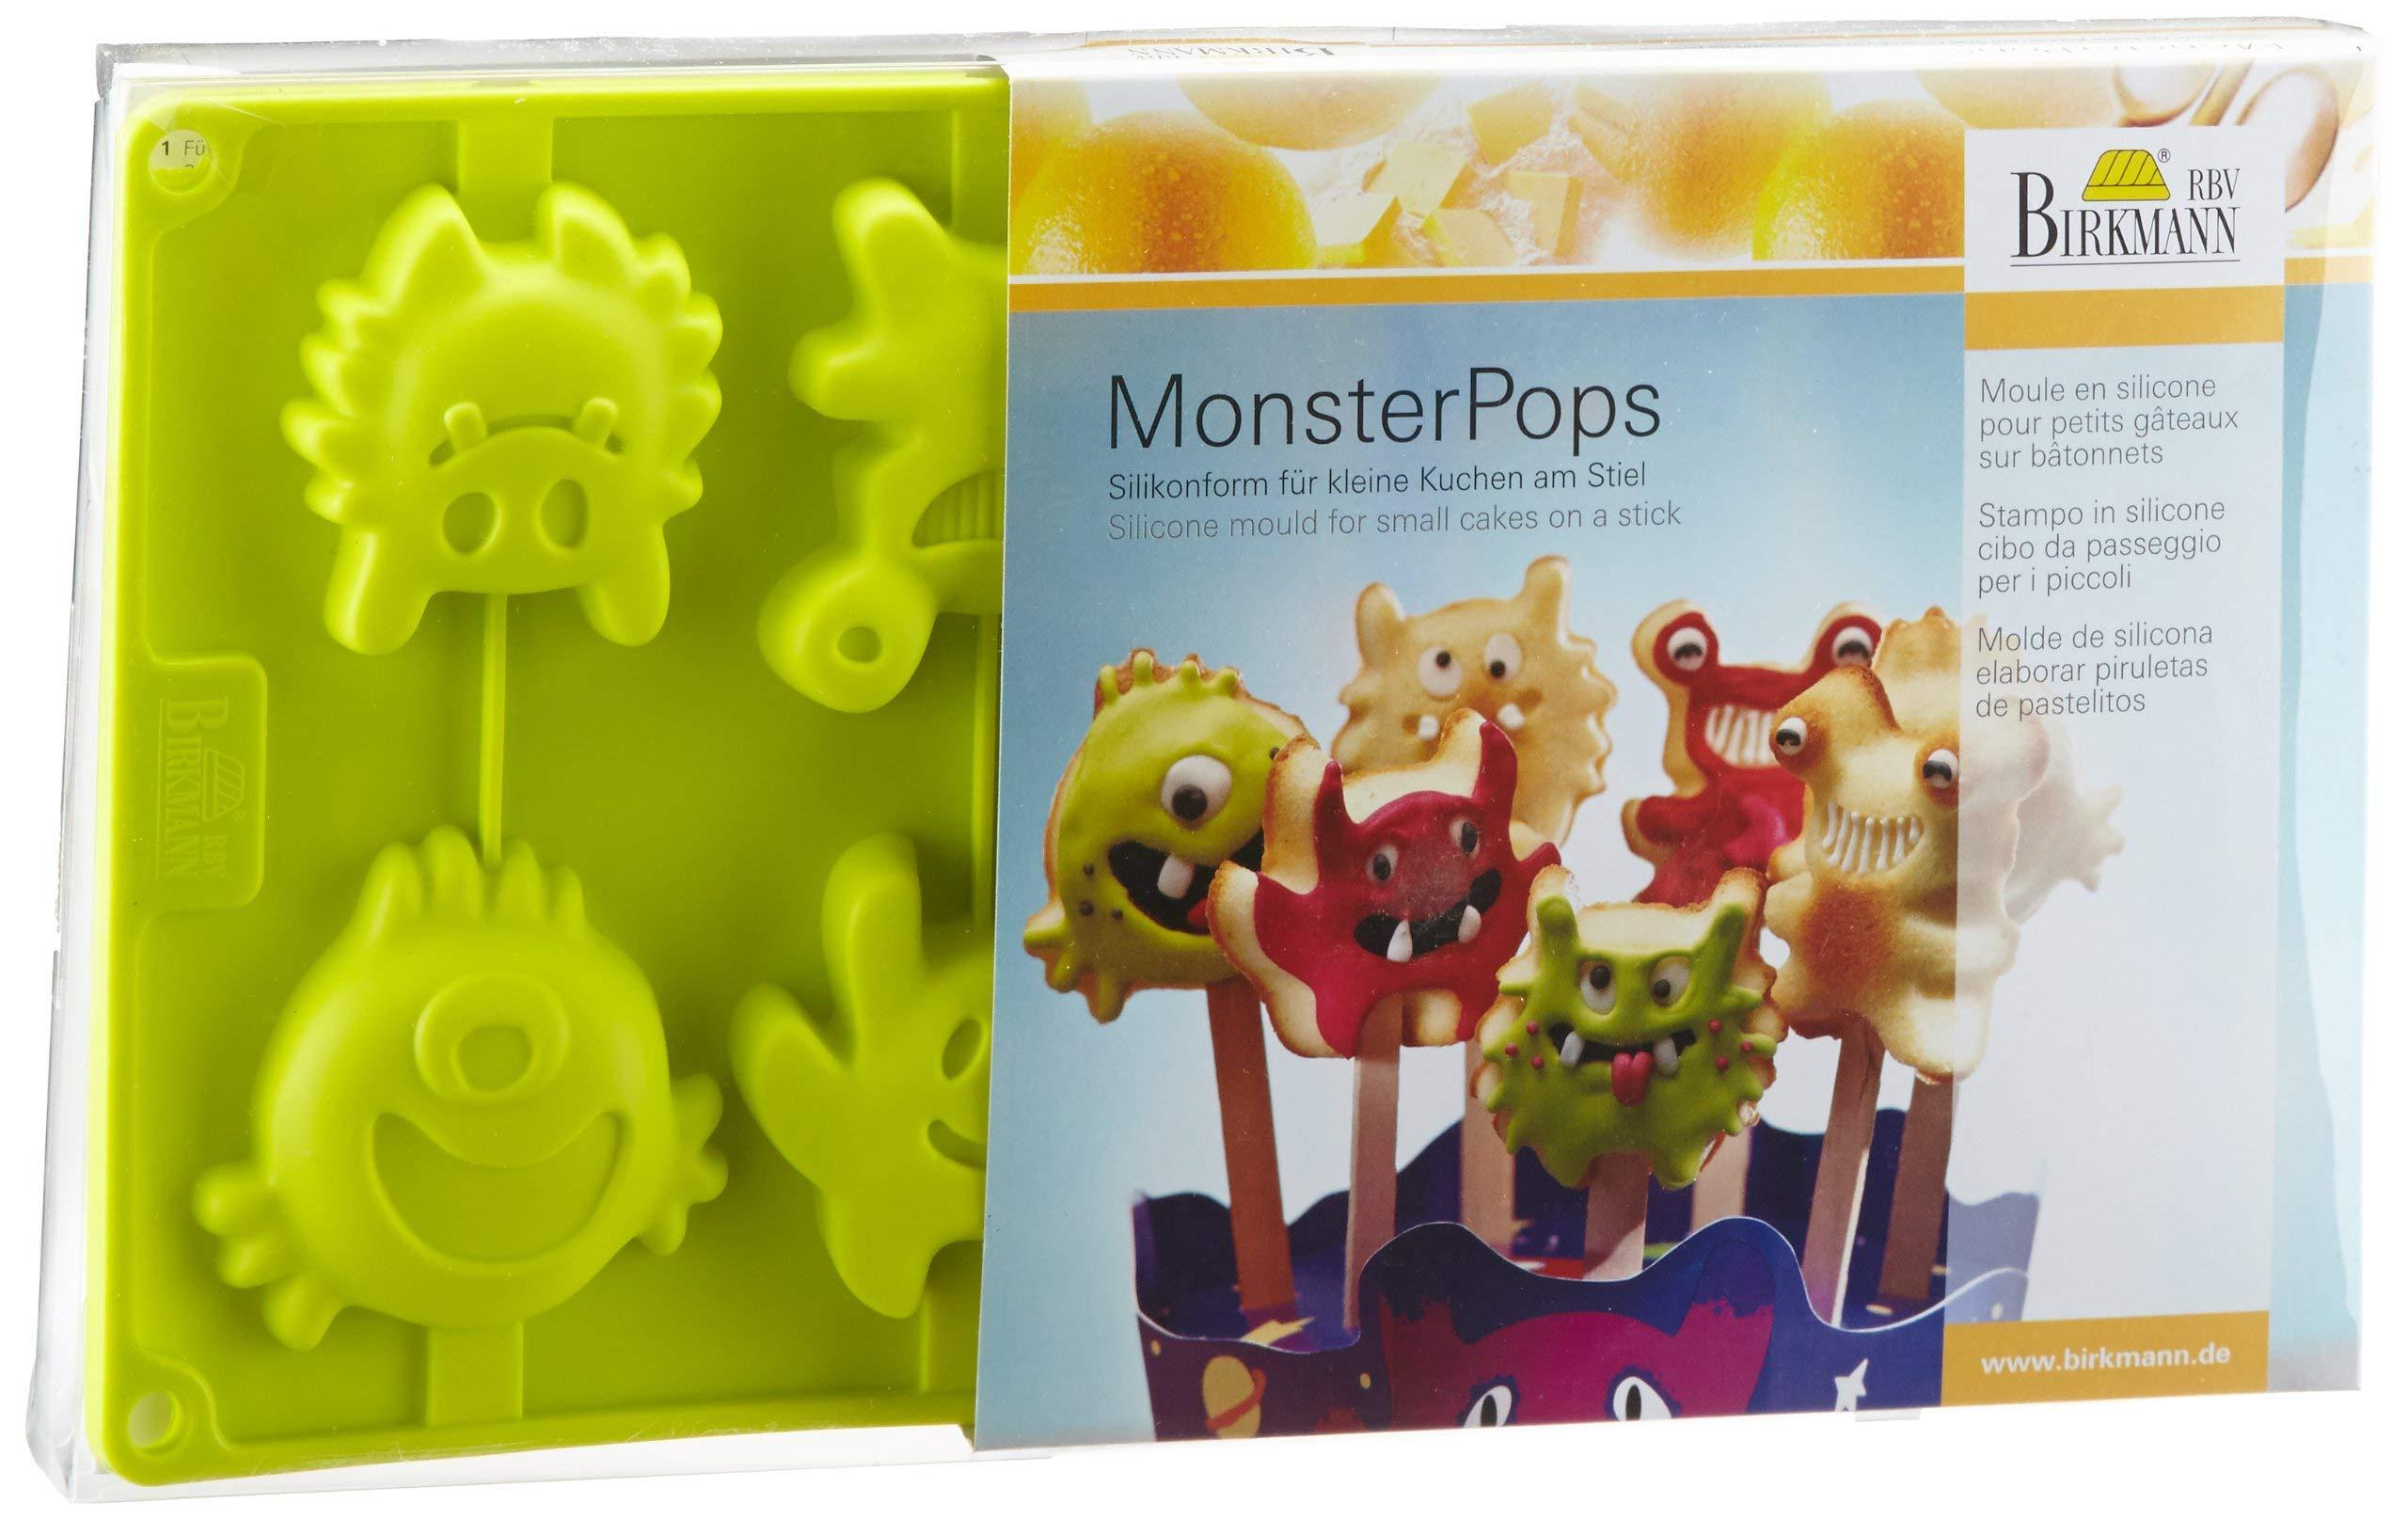 Birkmann Silicone Monster Pops Baking Mold